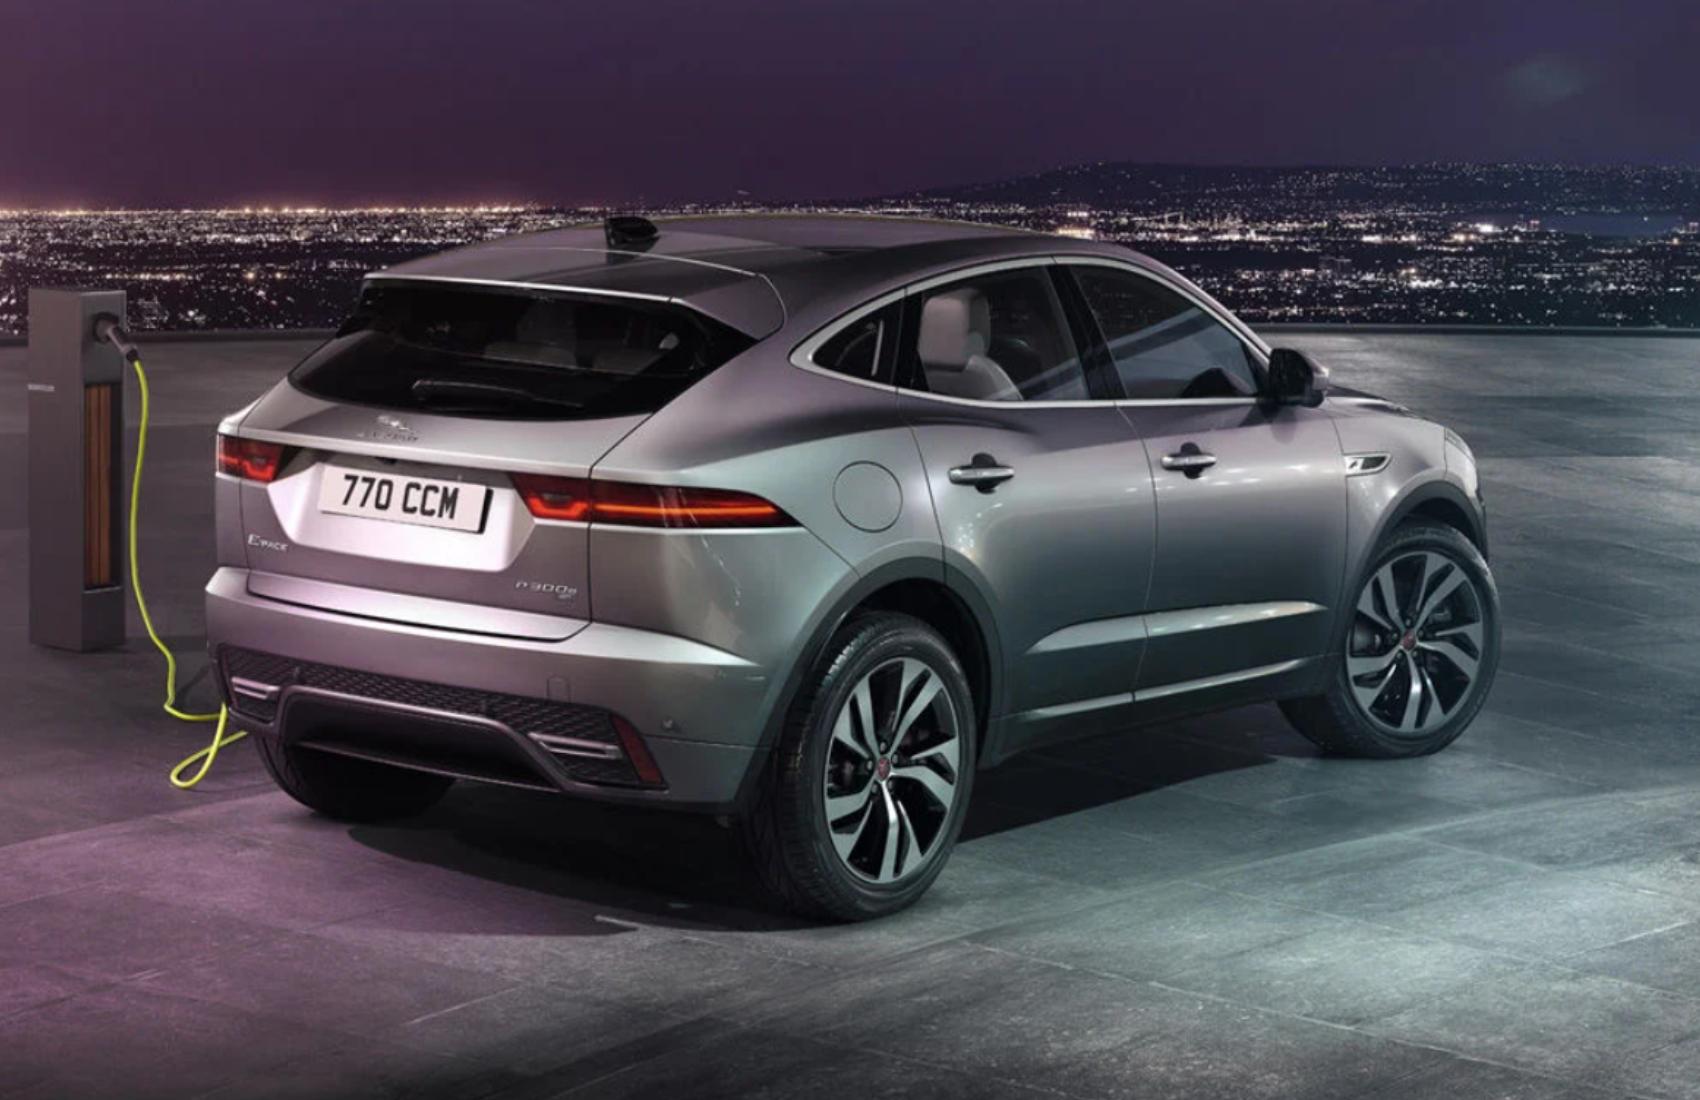 Descopera noul Jaguar E-PACE PHEV